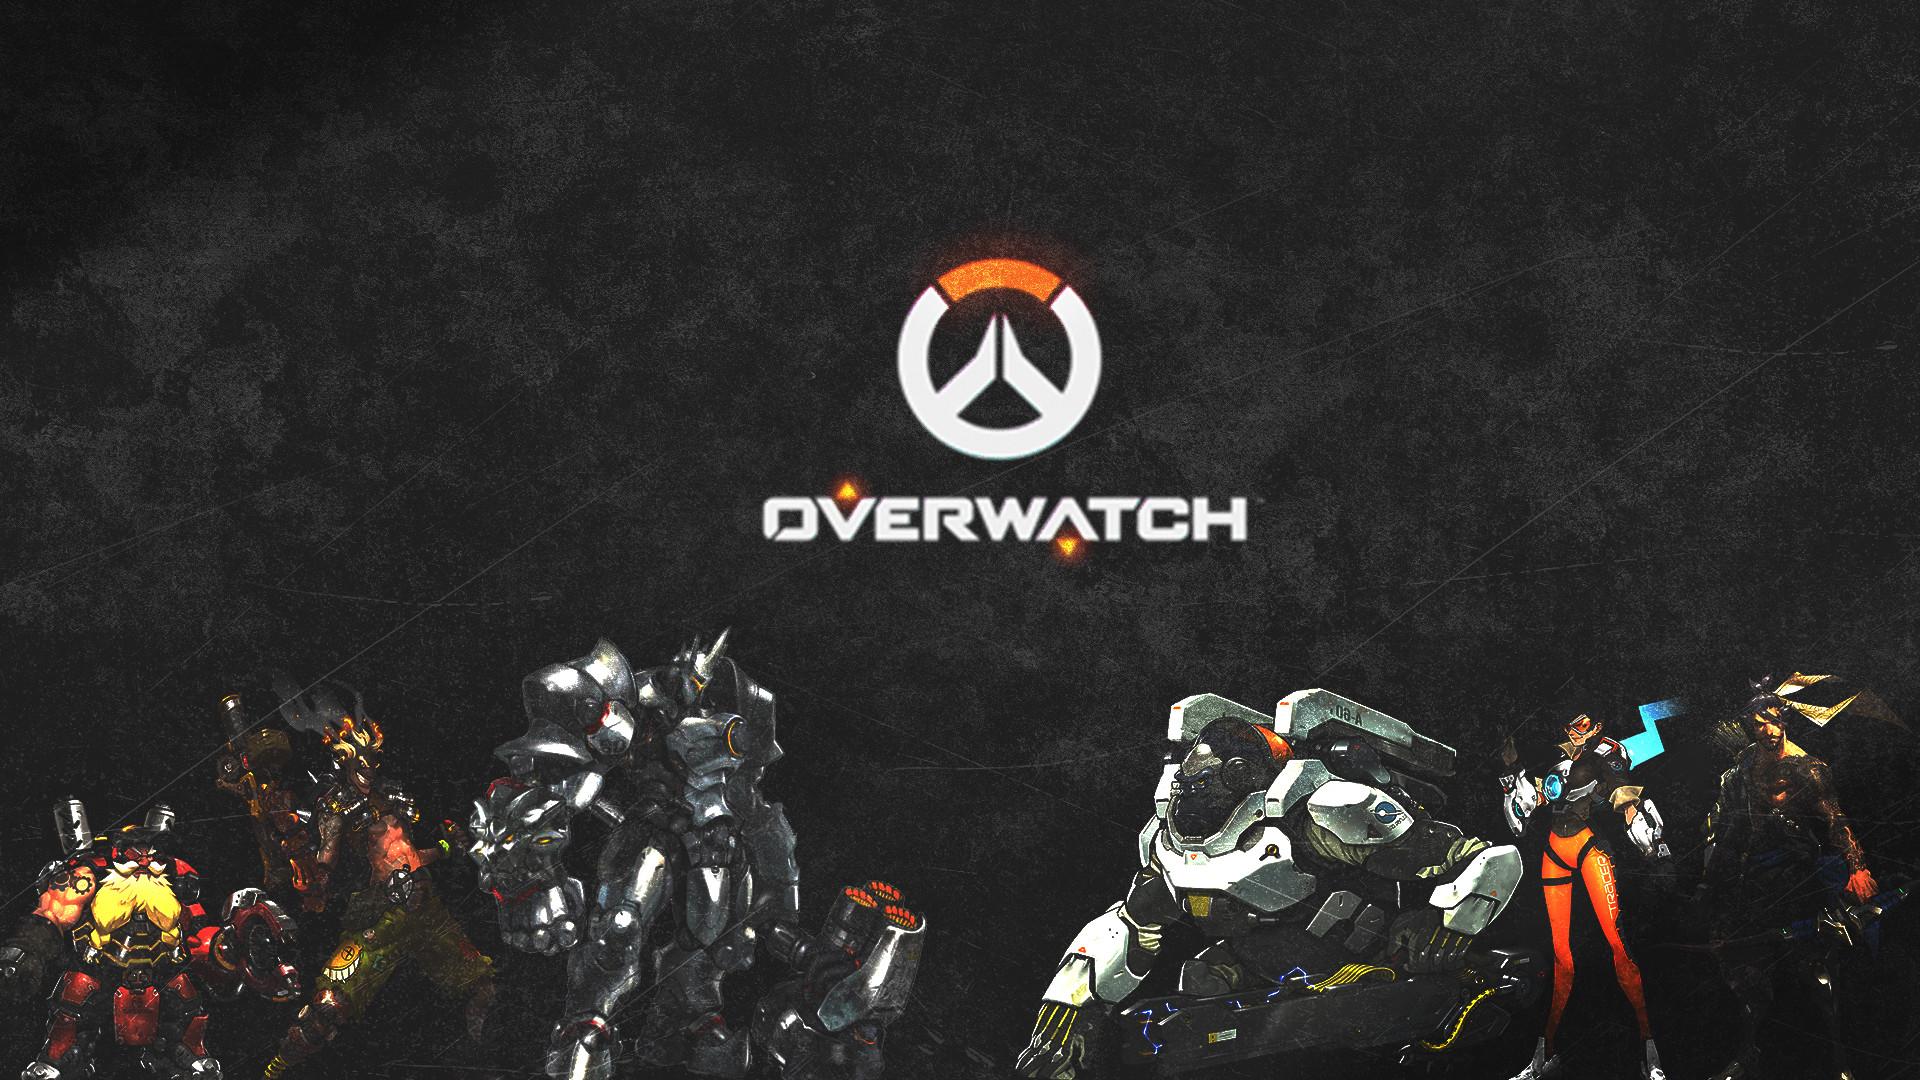 Video Game РOverwatch Torbj̦rn (Overwatch) Junkrat (Overwatch) Reinhardt ( Overwatch)